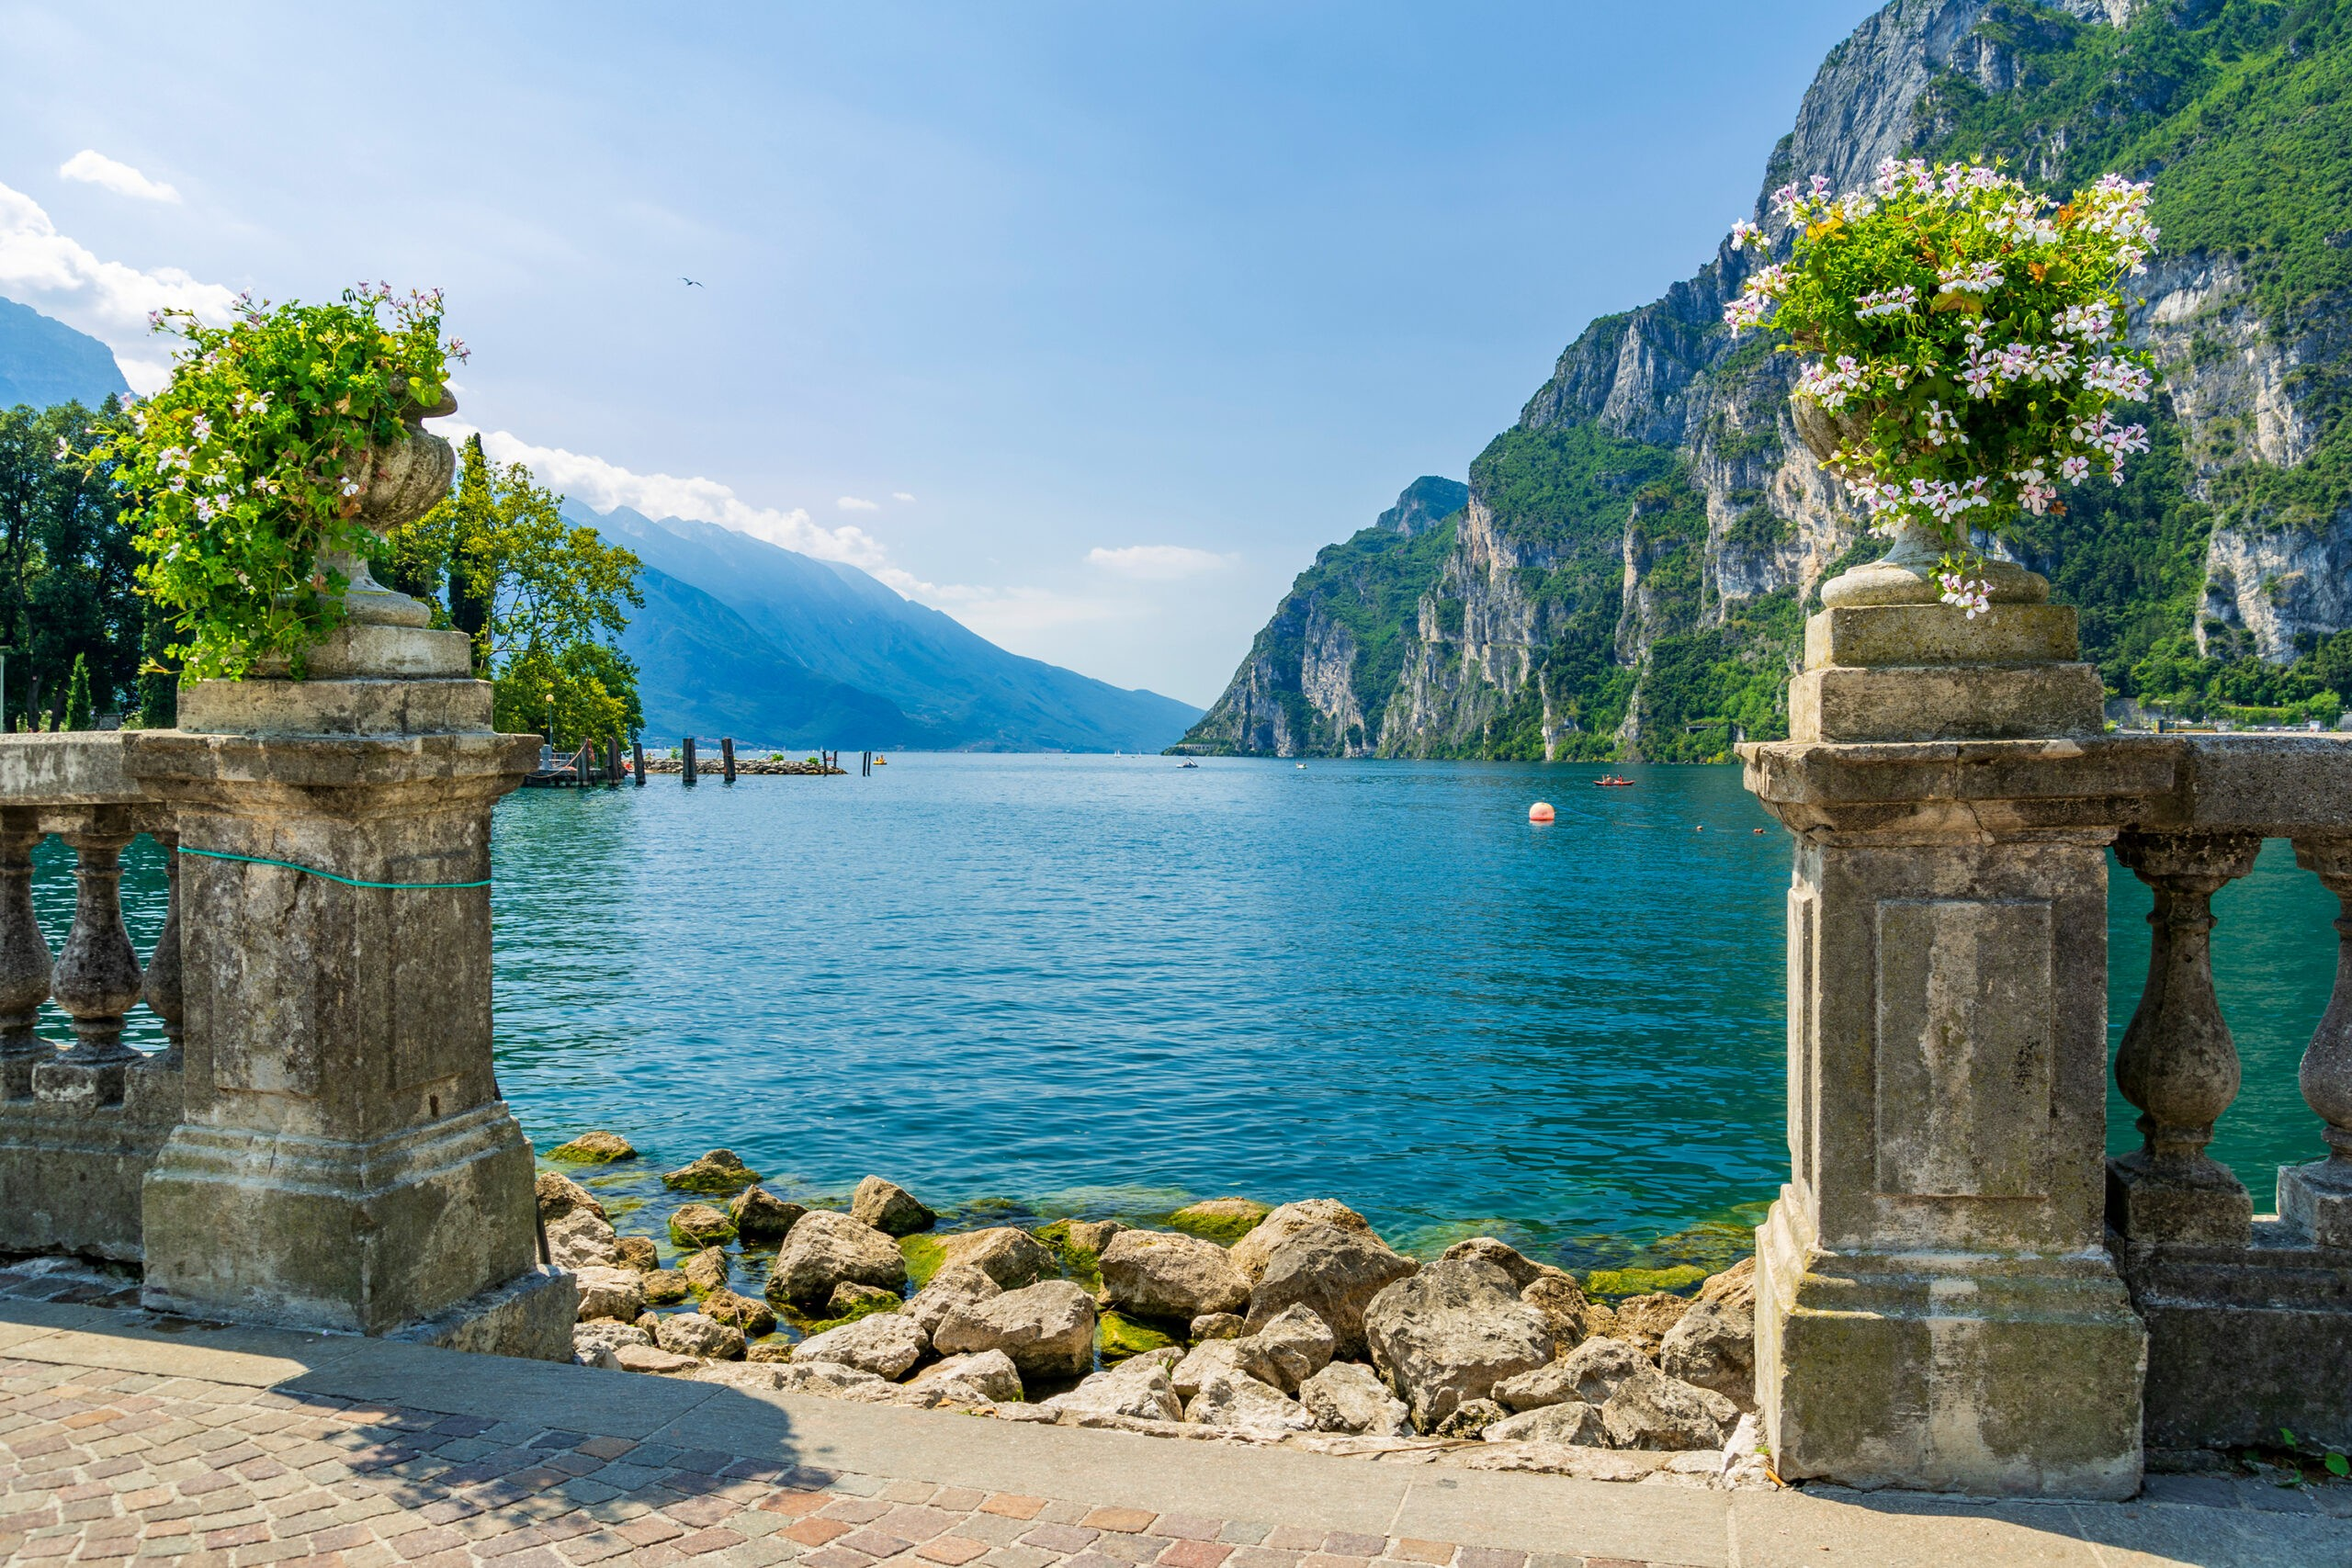 Riva del Garda nad jeziorem garda, Włochy, fot. shutterstock.com